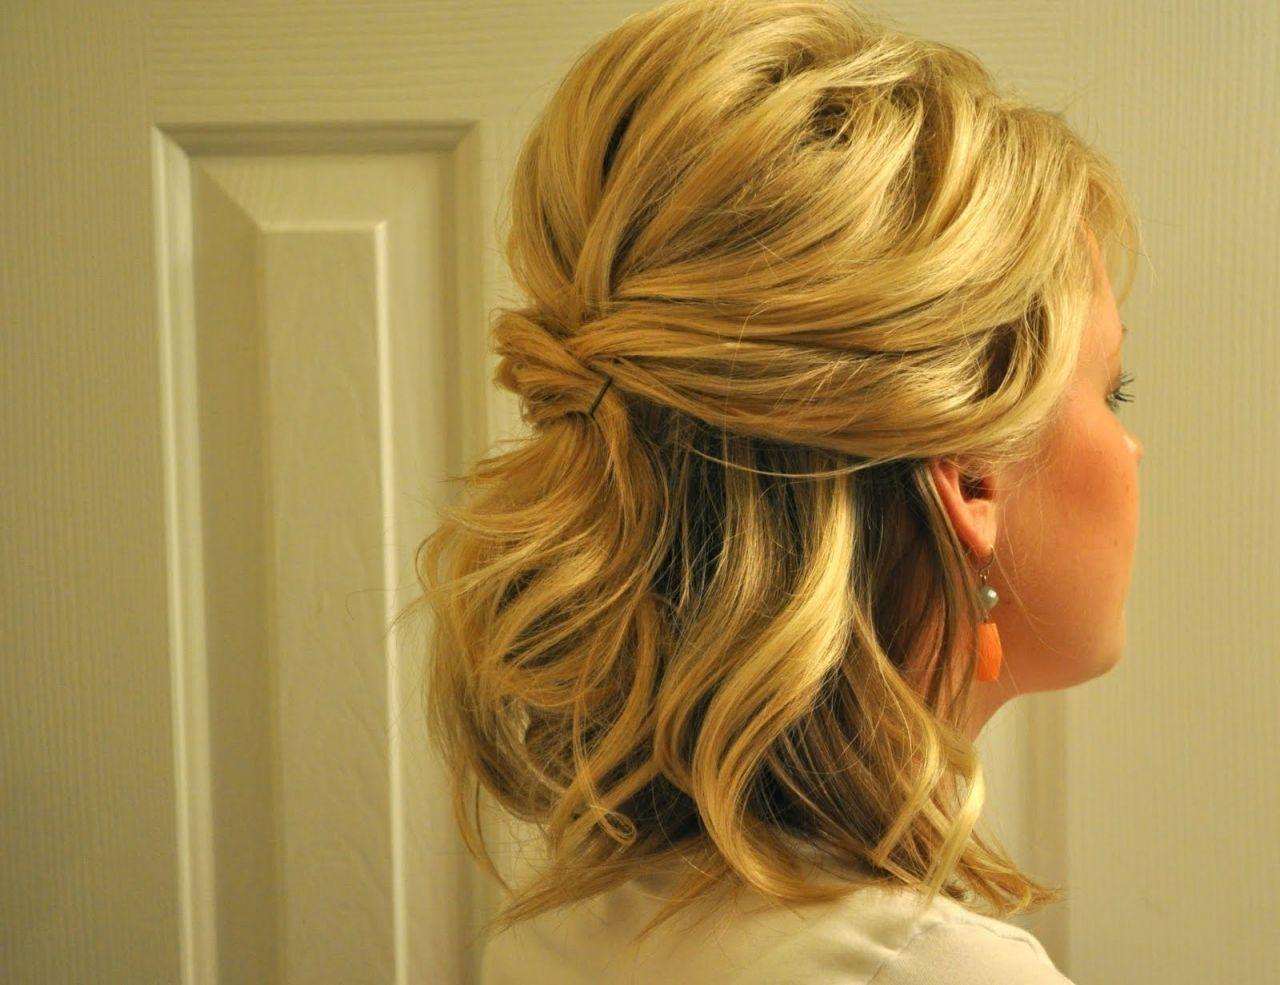 Updos For Medium Hair Half Up Half Down Half Up Half Down Wedding Hairstyles For Medium L Short Hair Lengths Medium Length Hair Styles Mother Of The Bride Hair